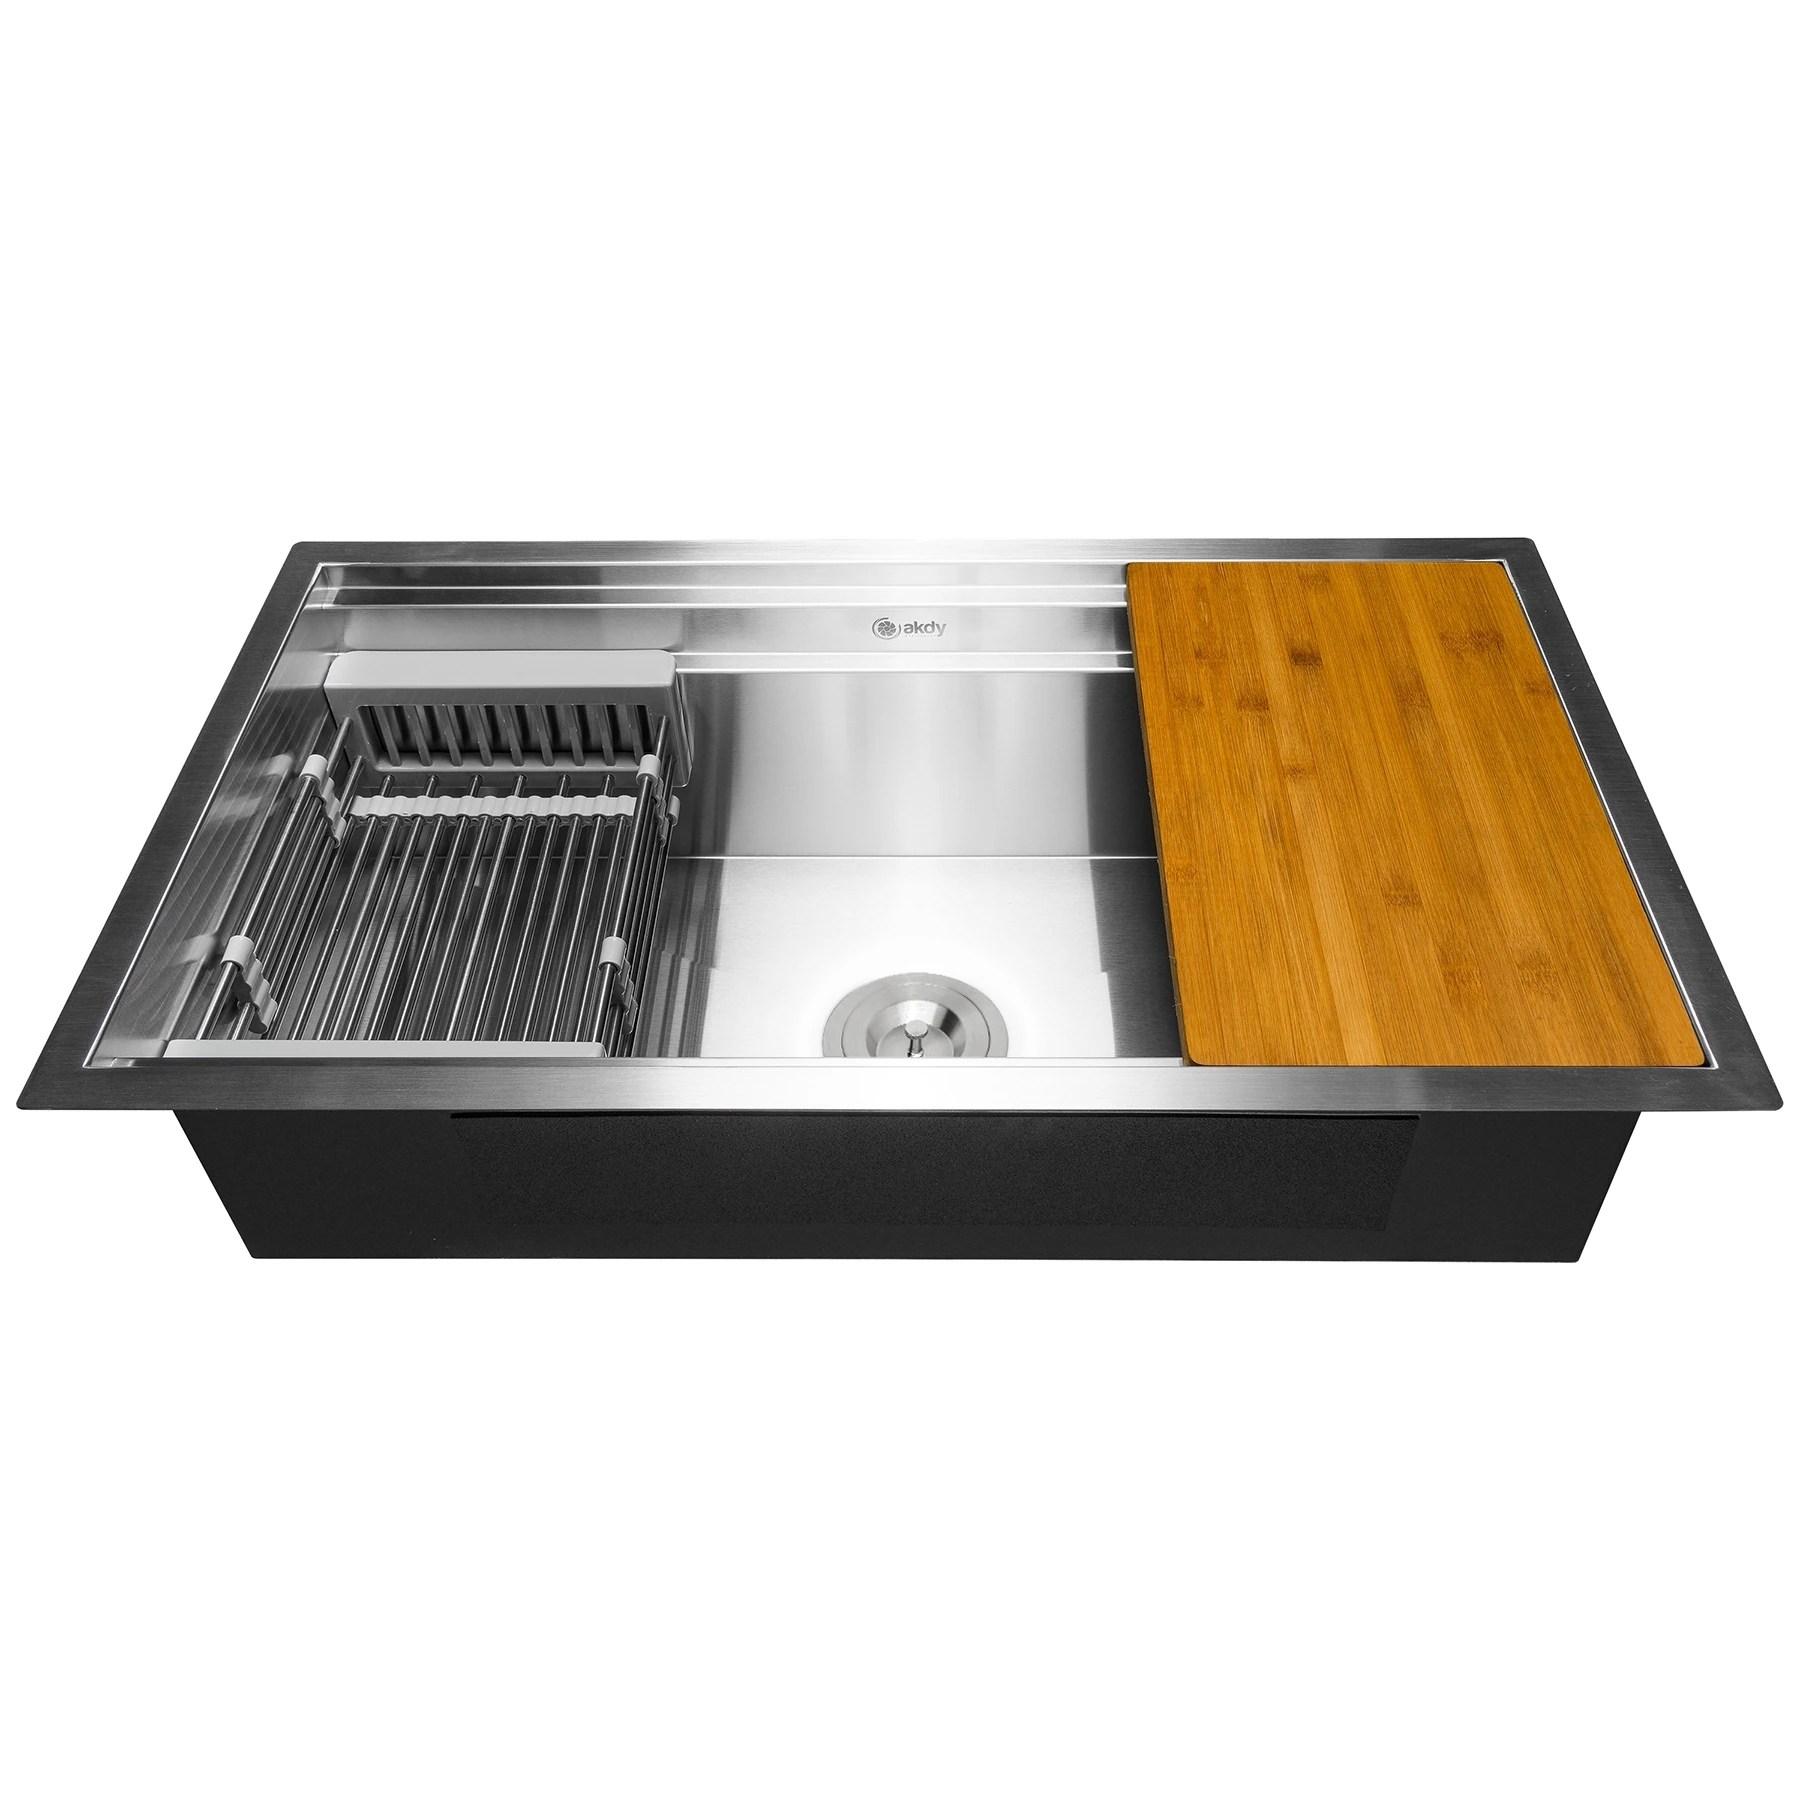 akdy 33 x 22 x 9 undermount stainless steel single bowl kitchen sink silver